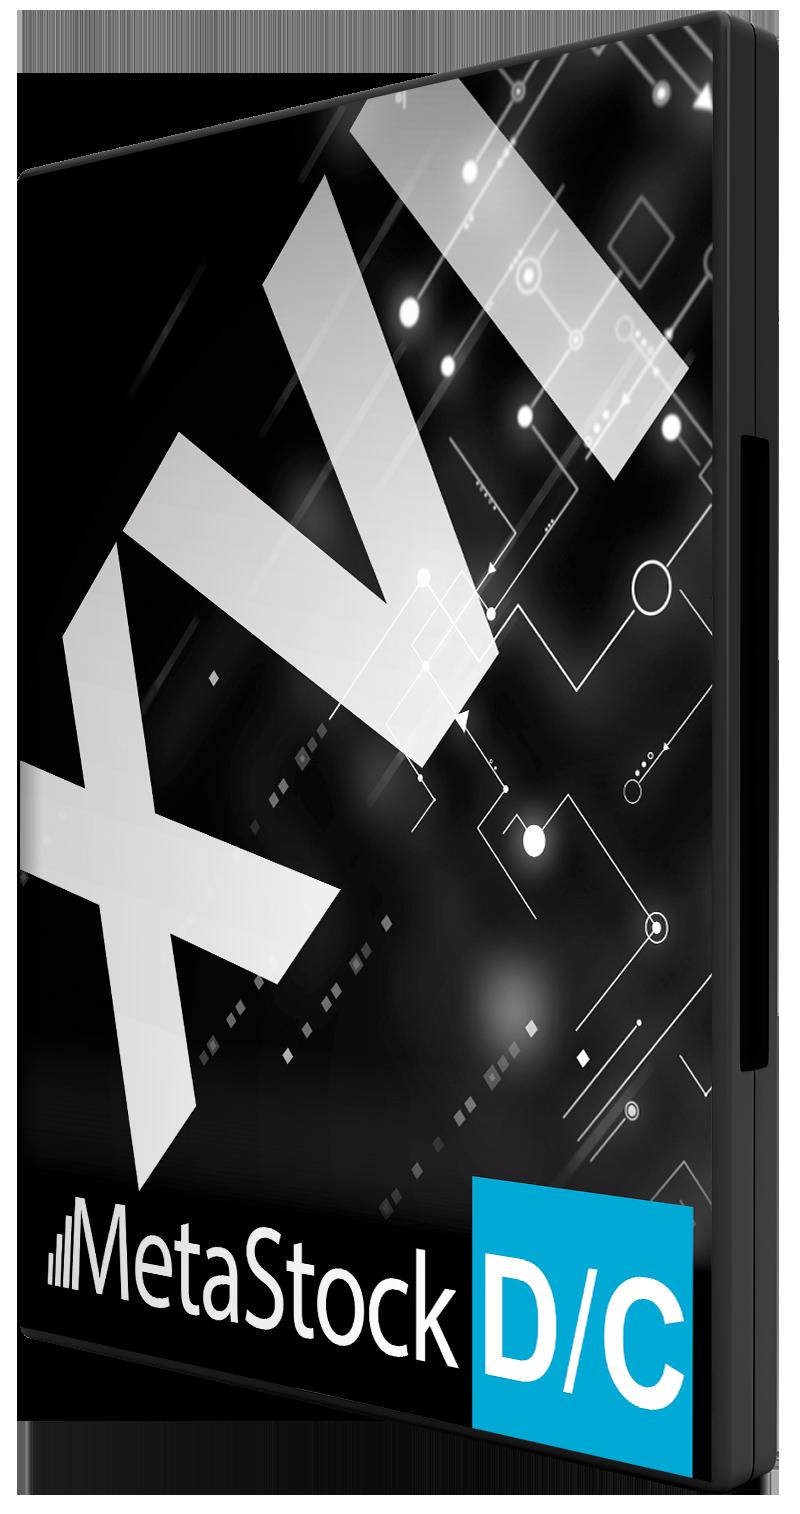 MetaStock Product Image